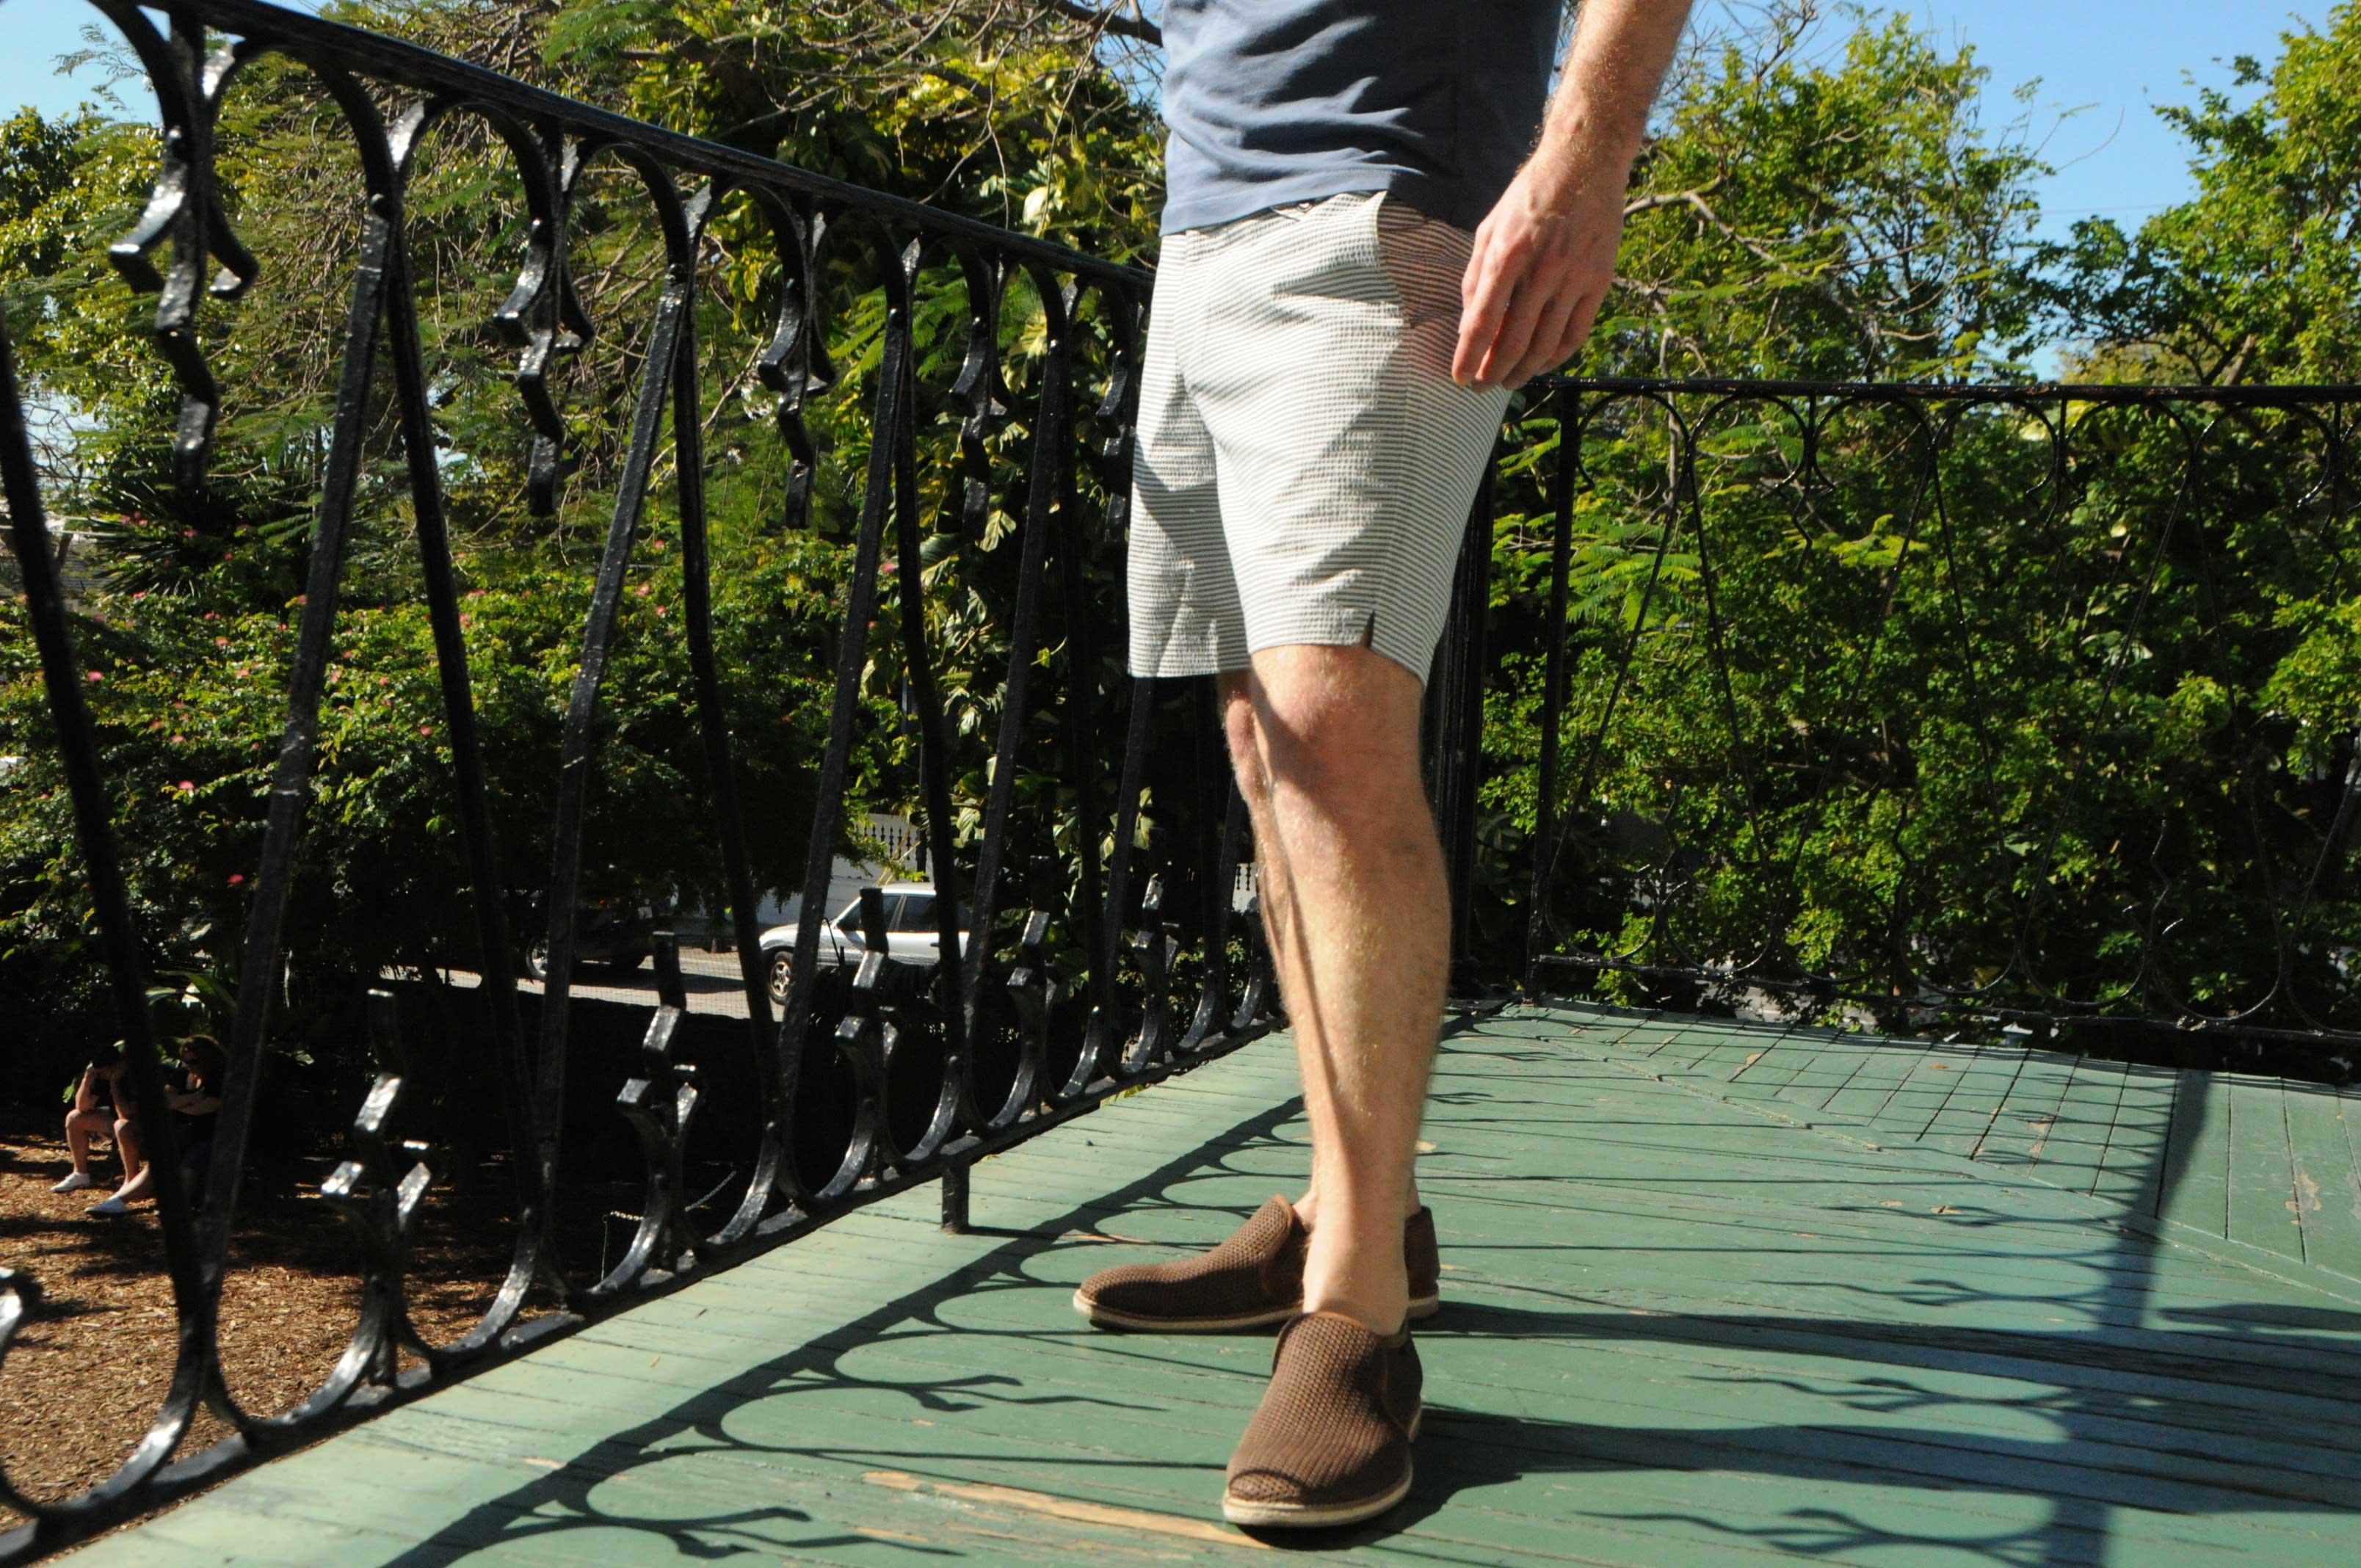 man standing on balcony hemingway house wearing Hemingsworth seerseucker and brown loafers